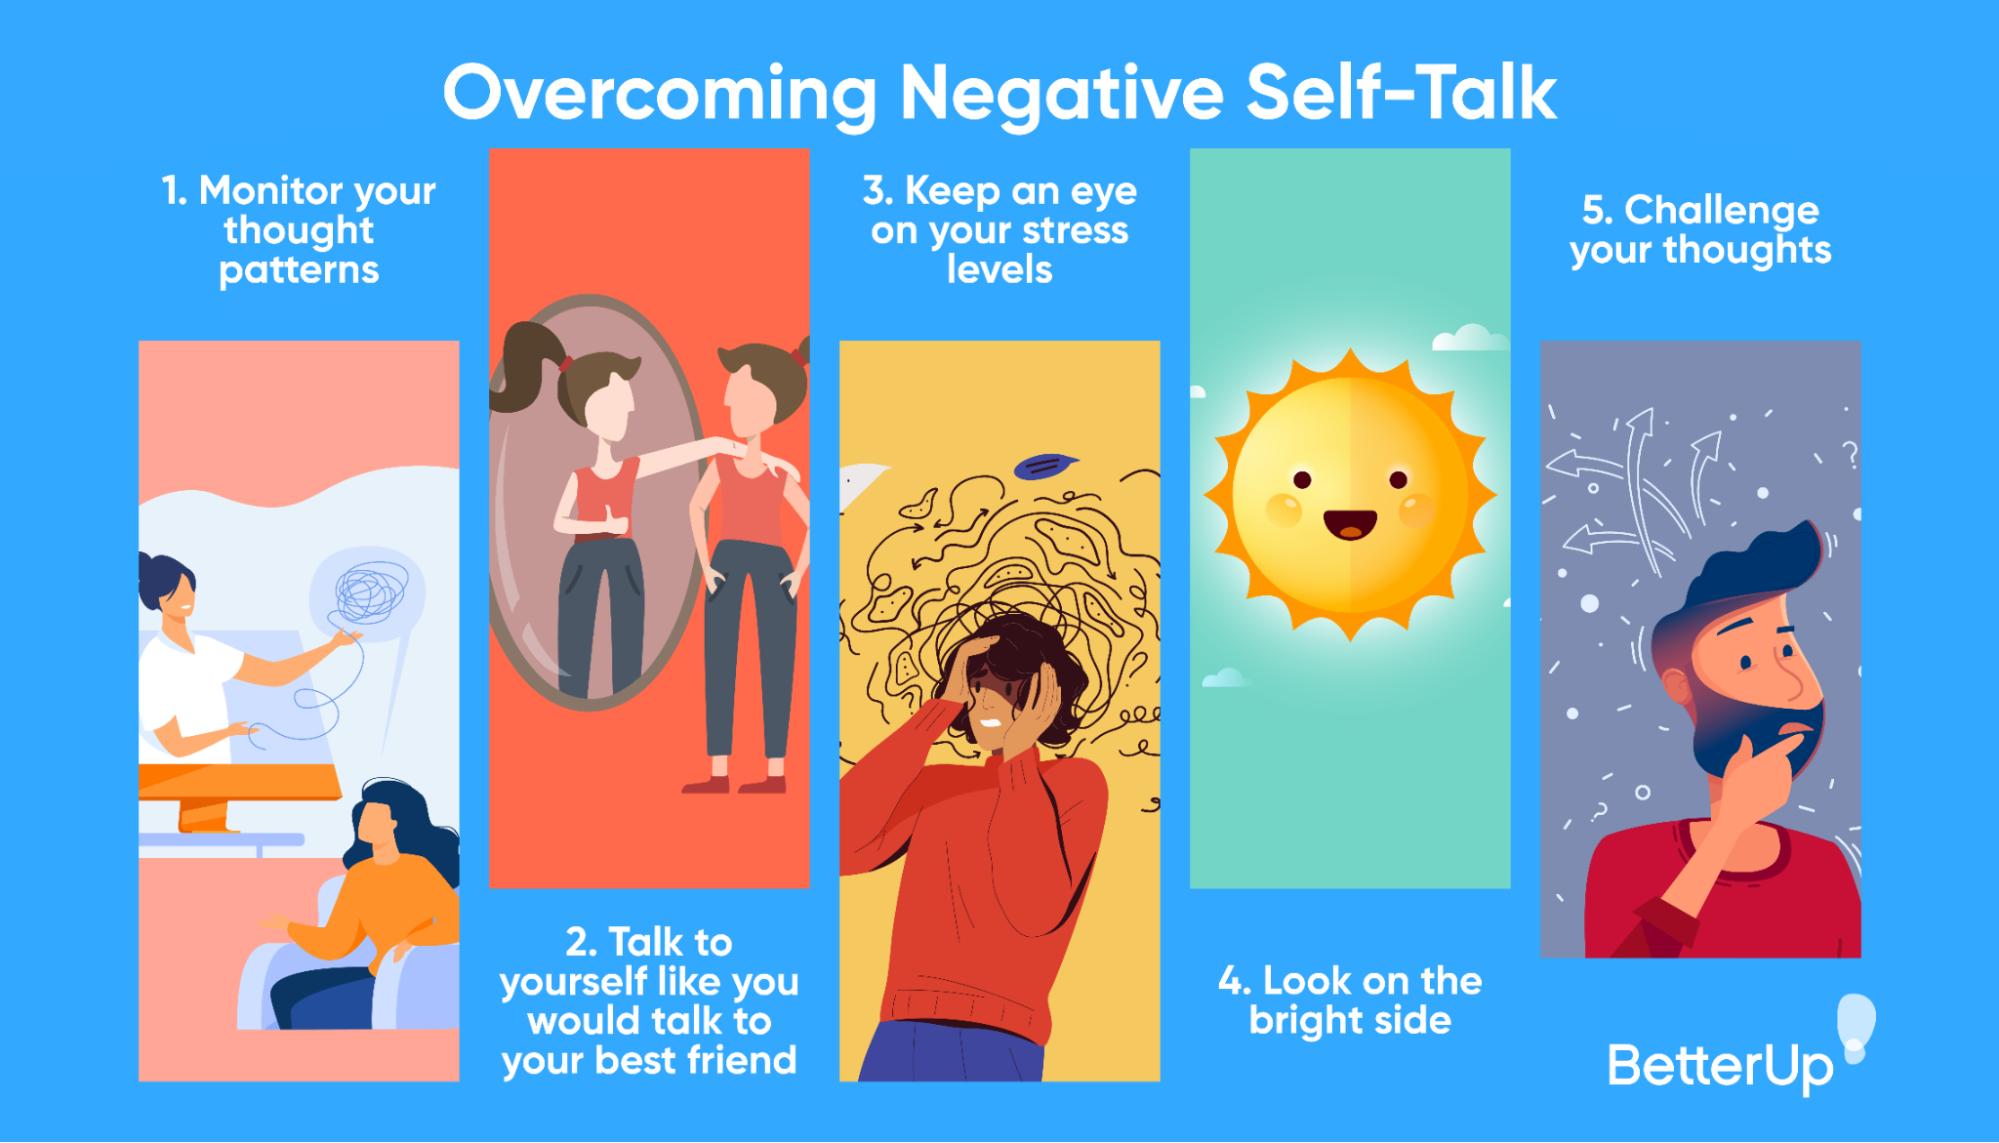 overcoming-negative-thinking-self-talk